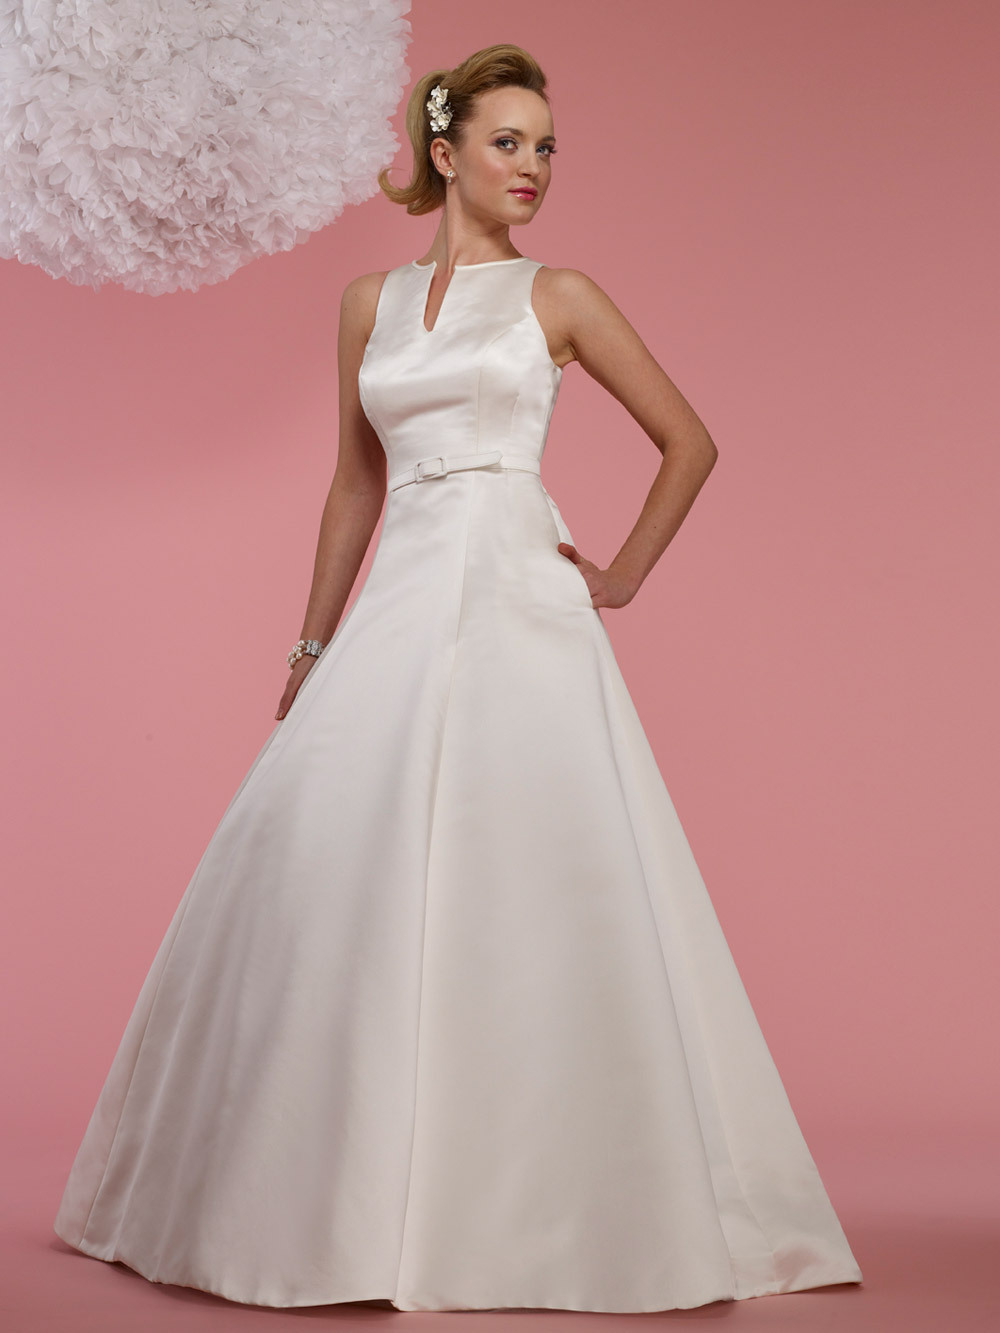 Modest-2012-wedding-dress-notched-neckline.full